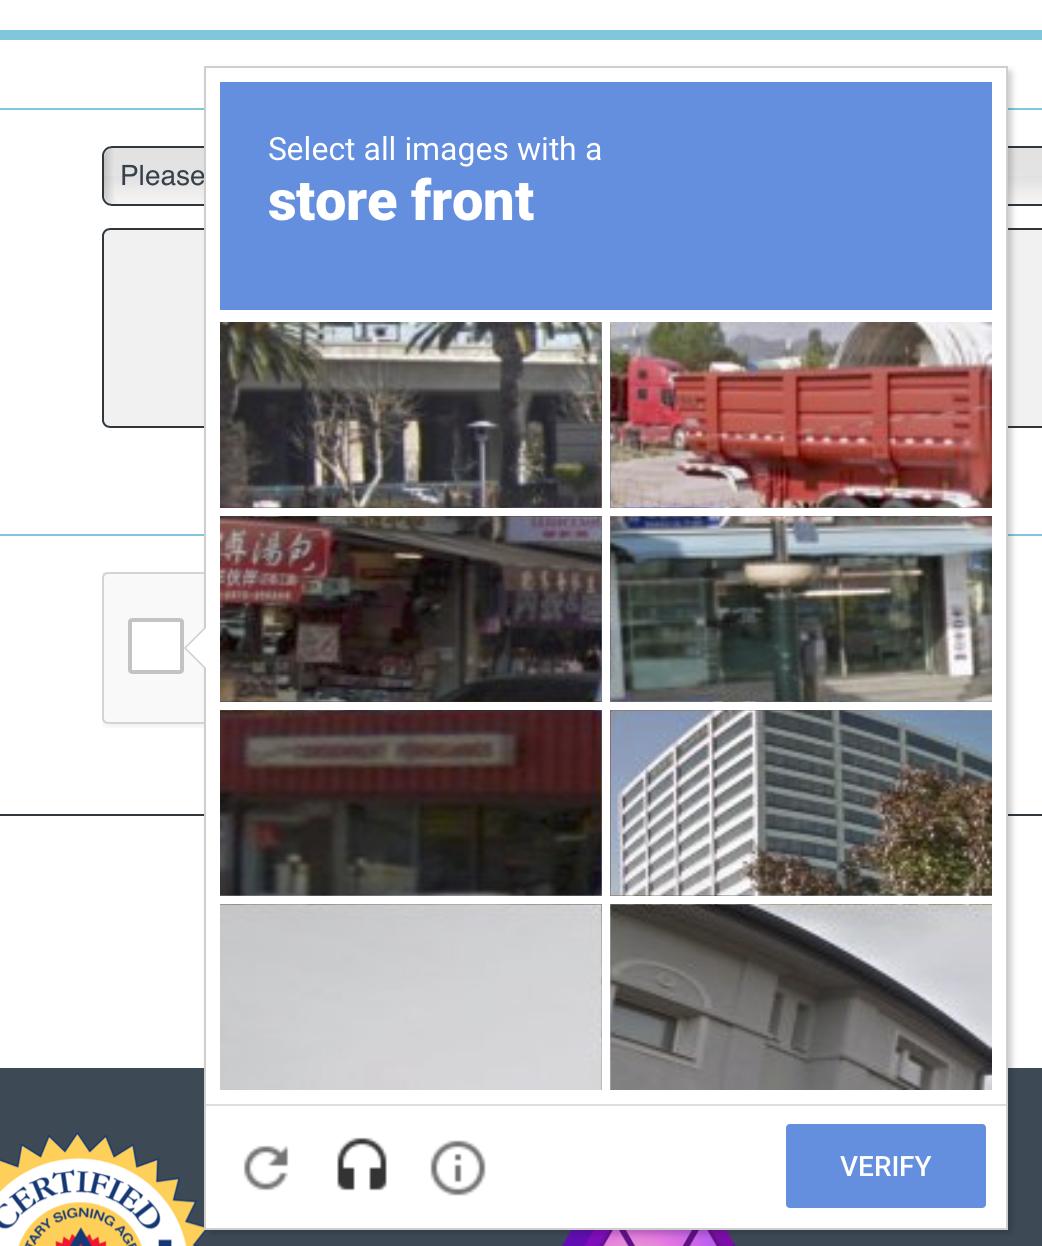 Invisible Recaptcha no longer working in Safari & Edge browsers